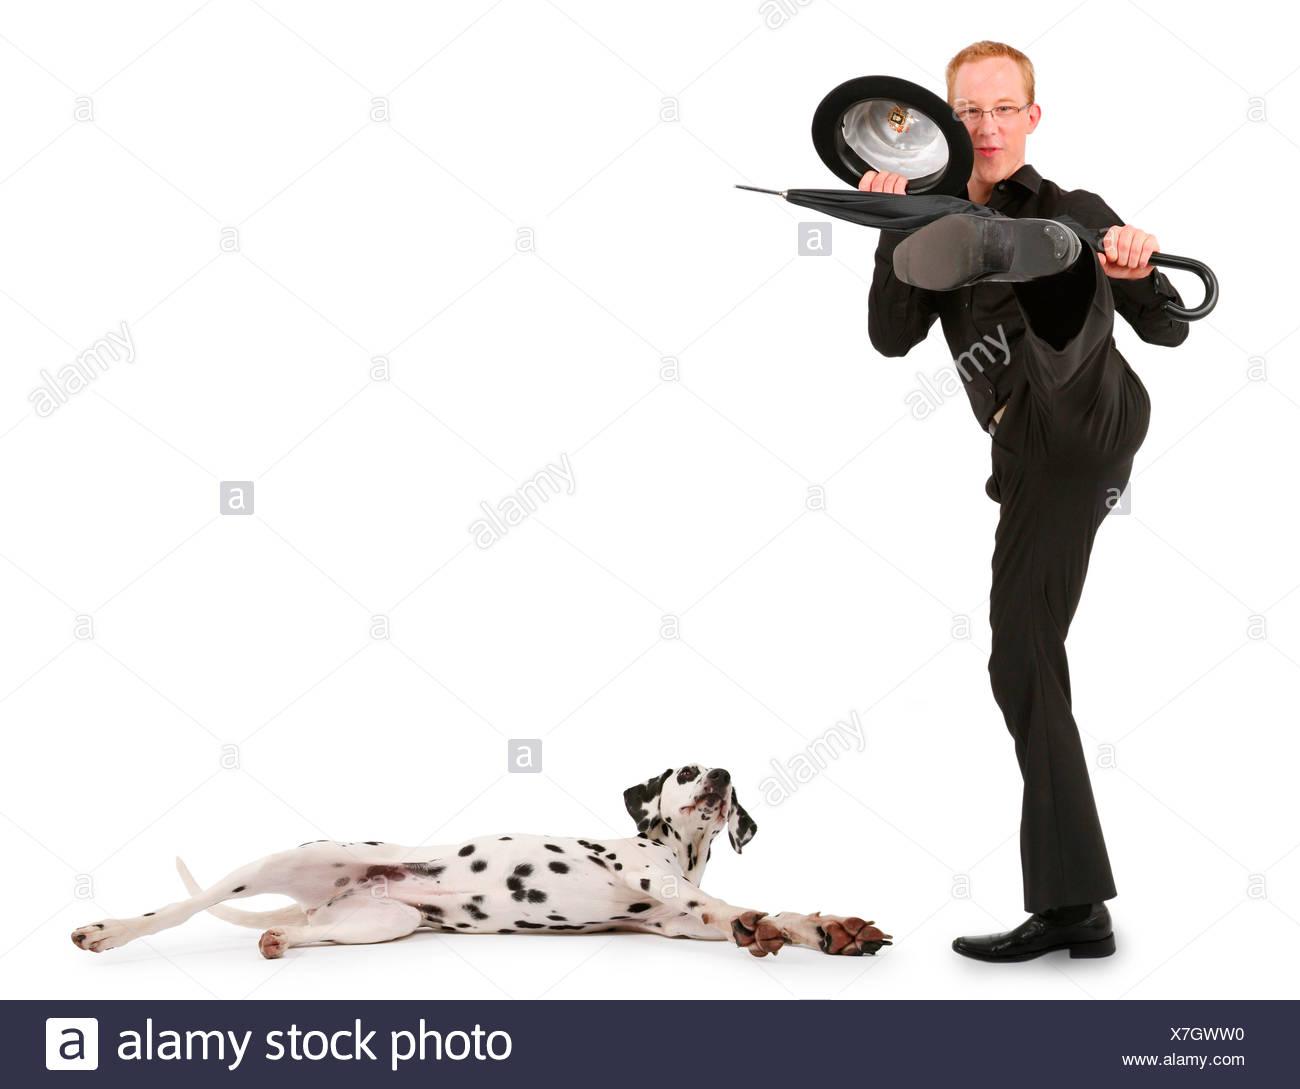 17ef9190fa9b2 Dog Umbrella Hat Stock Photos   Dog Umbrella Hat Stock Images - Alamy